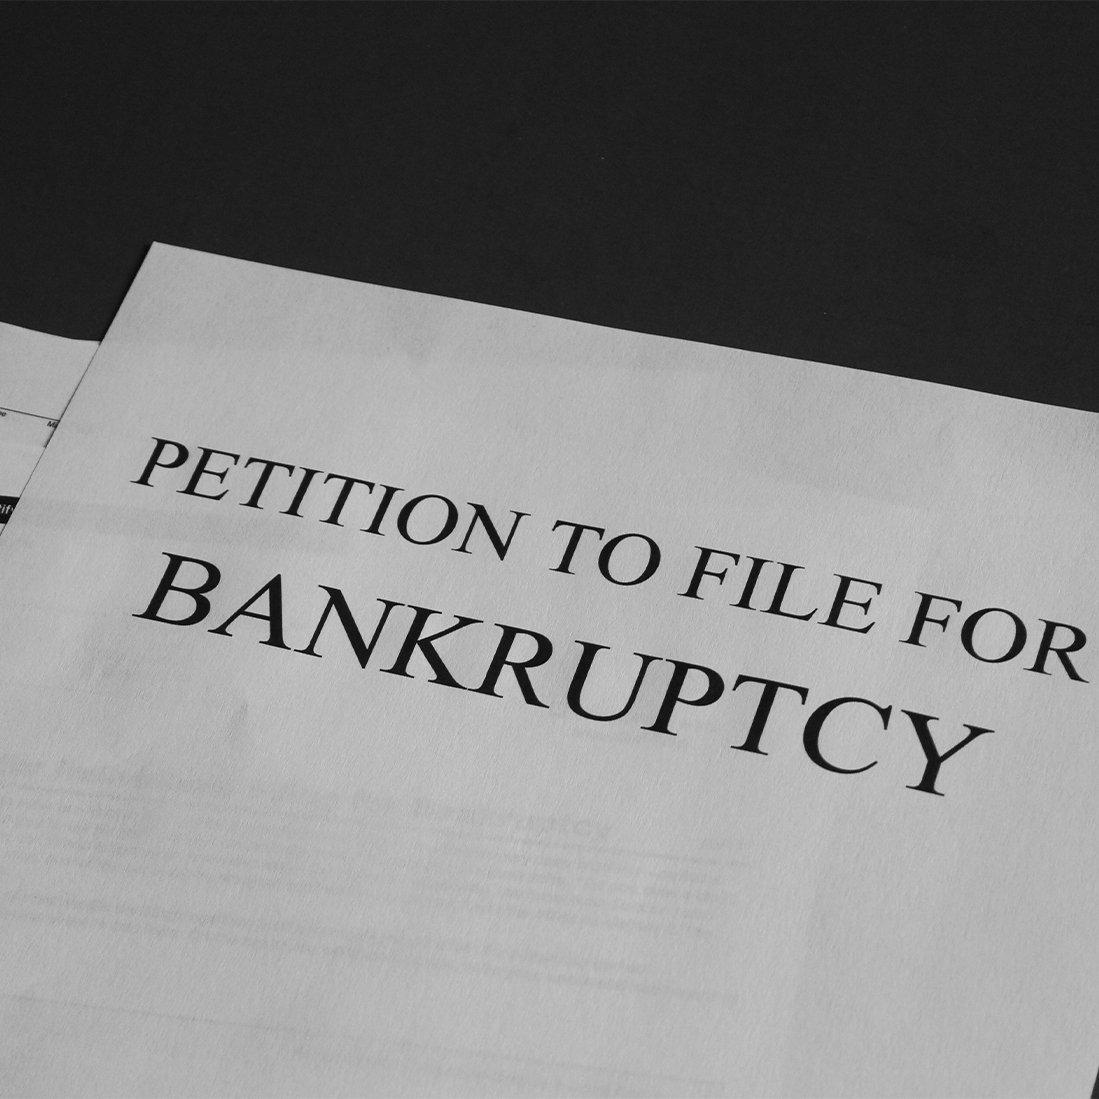 bankruptcy law  in Birmingham, Alabama